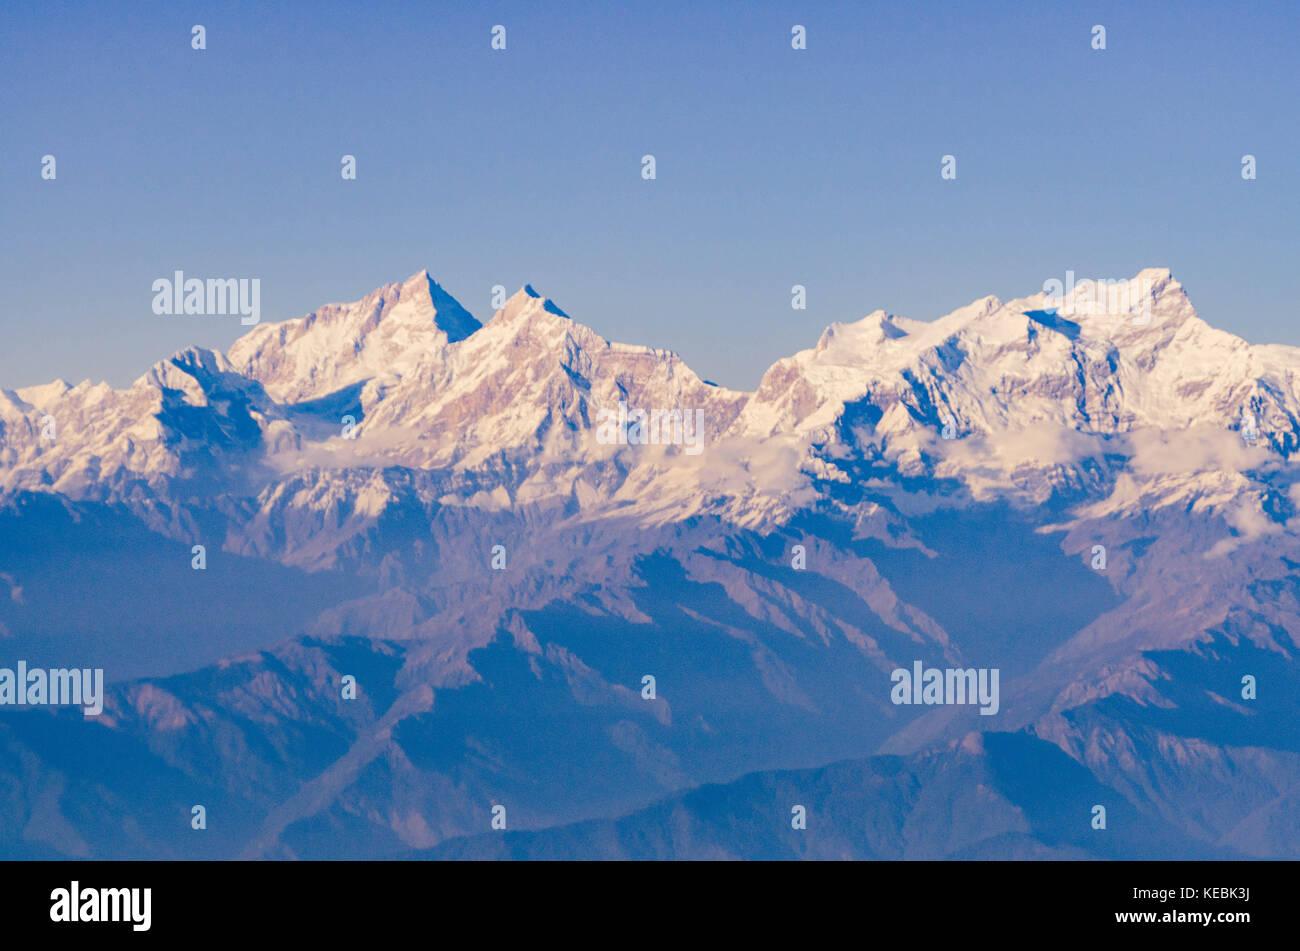 Nepal - Stock Image